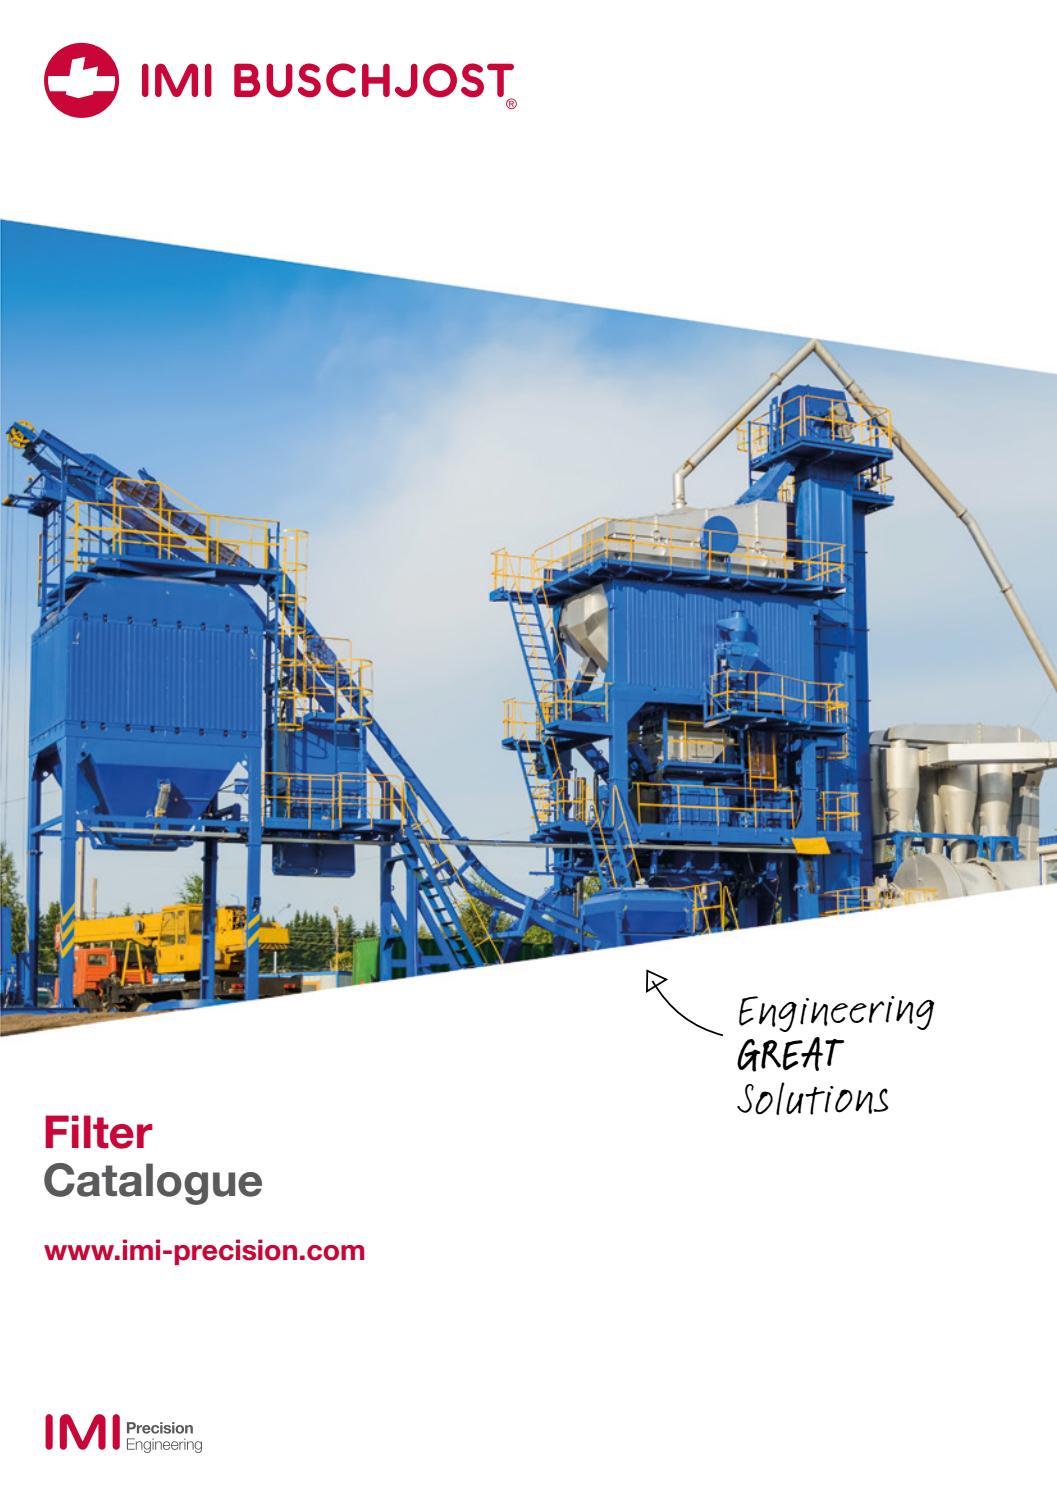 3//8 BSPT Three-Piece Operating Pressure: 145 psi Filter Regulator Lubricator